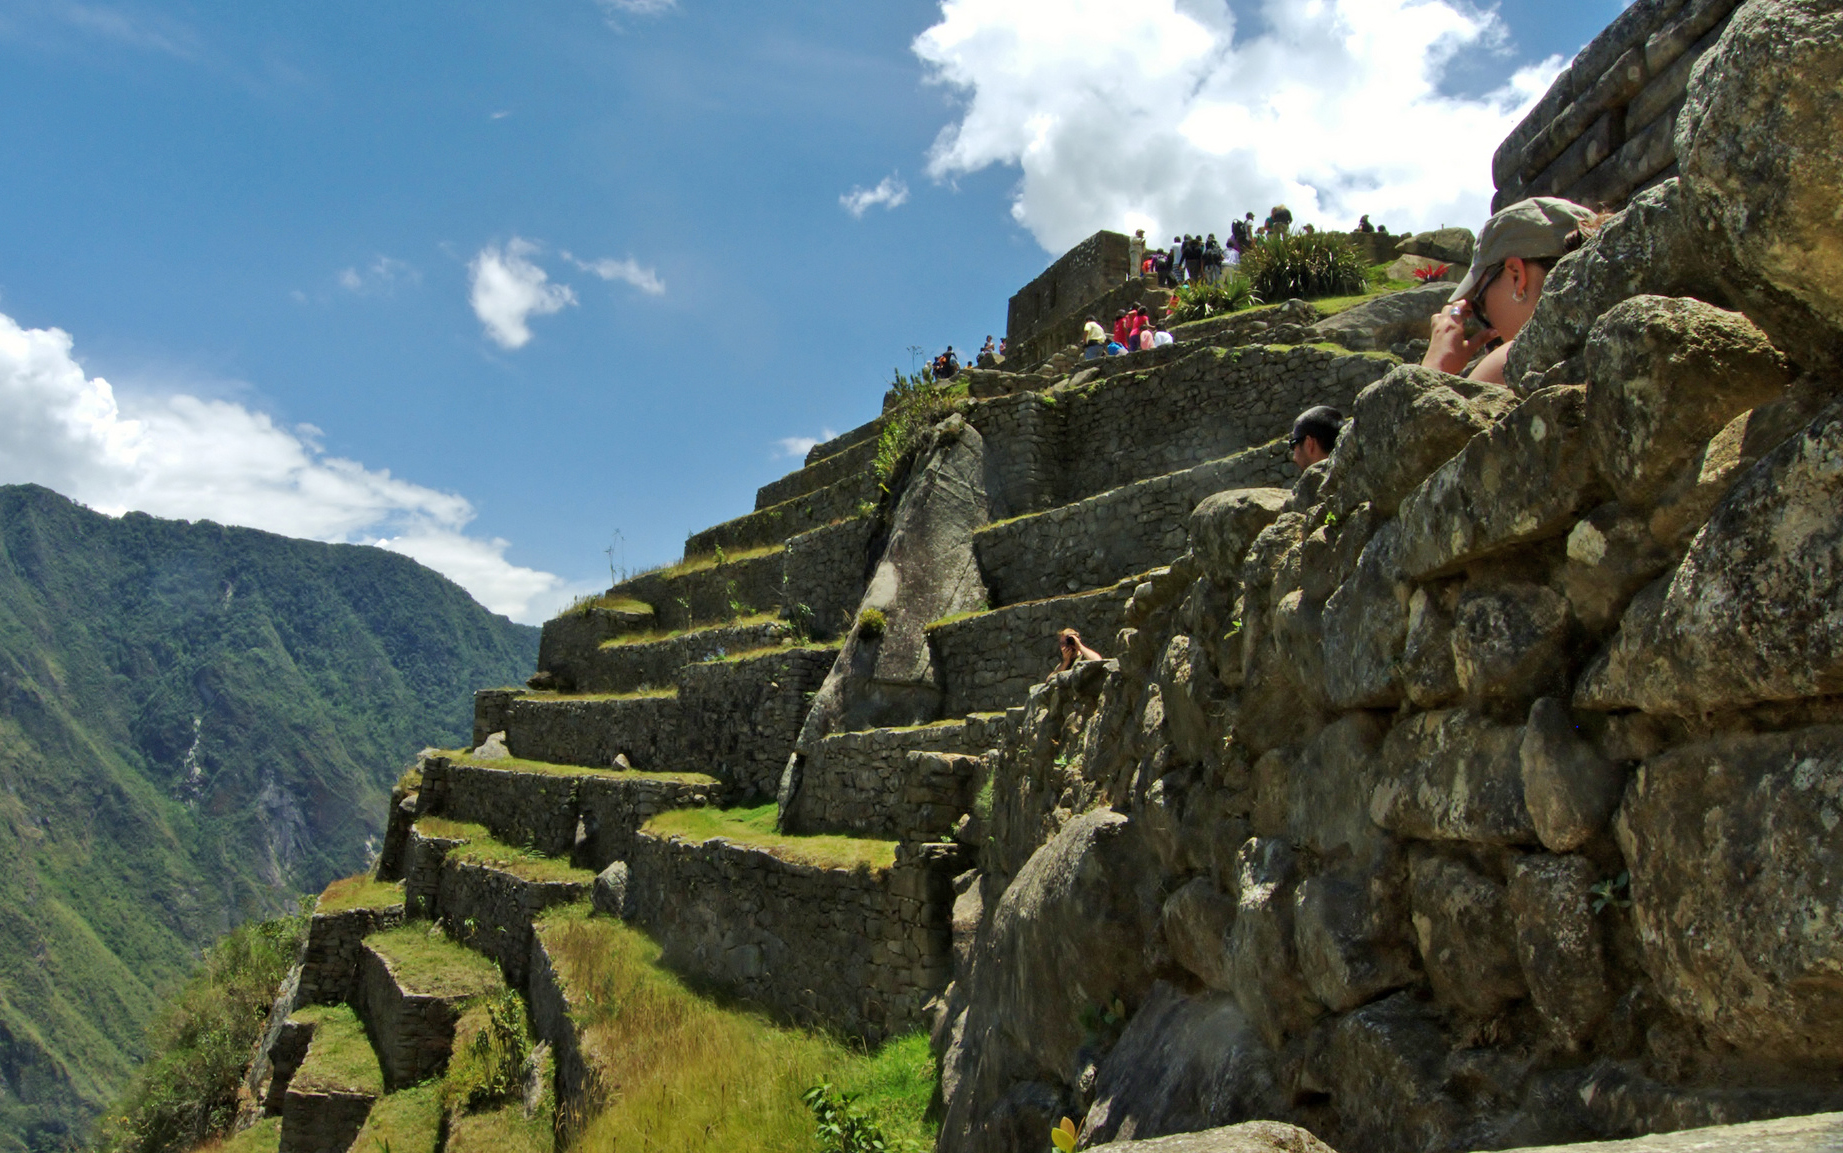 Turista en terrazas de Machu Picchu